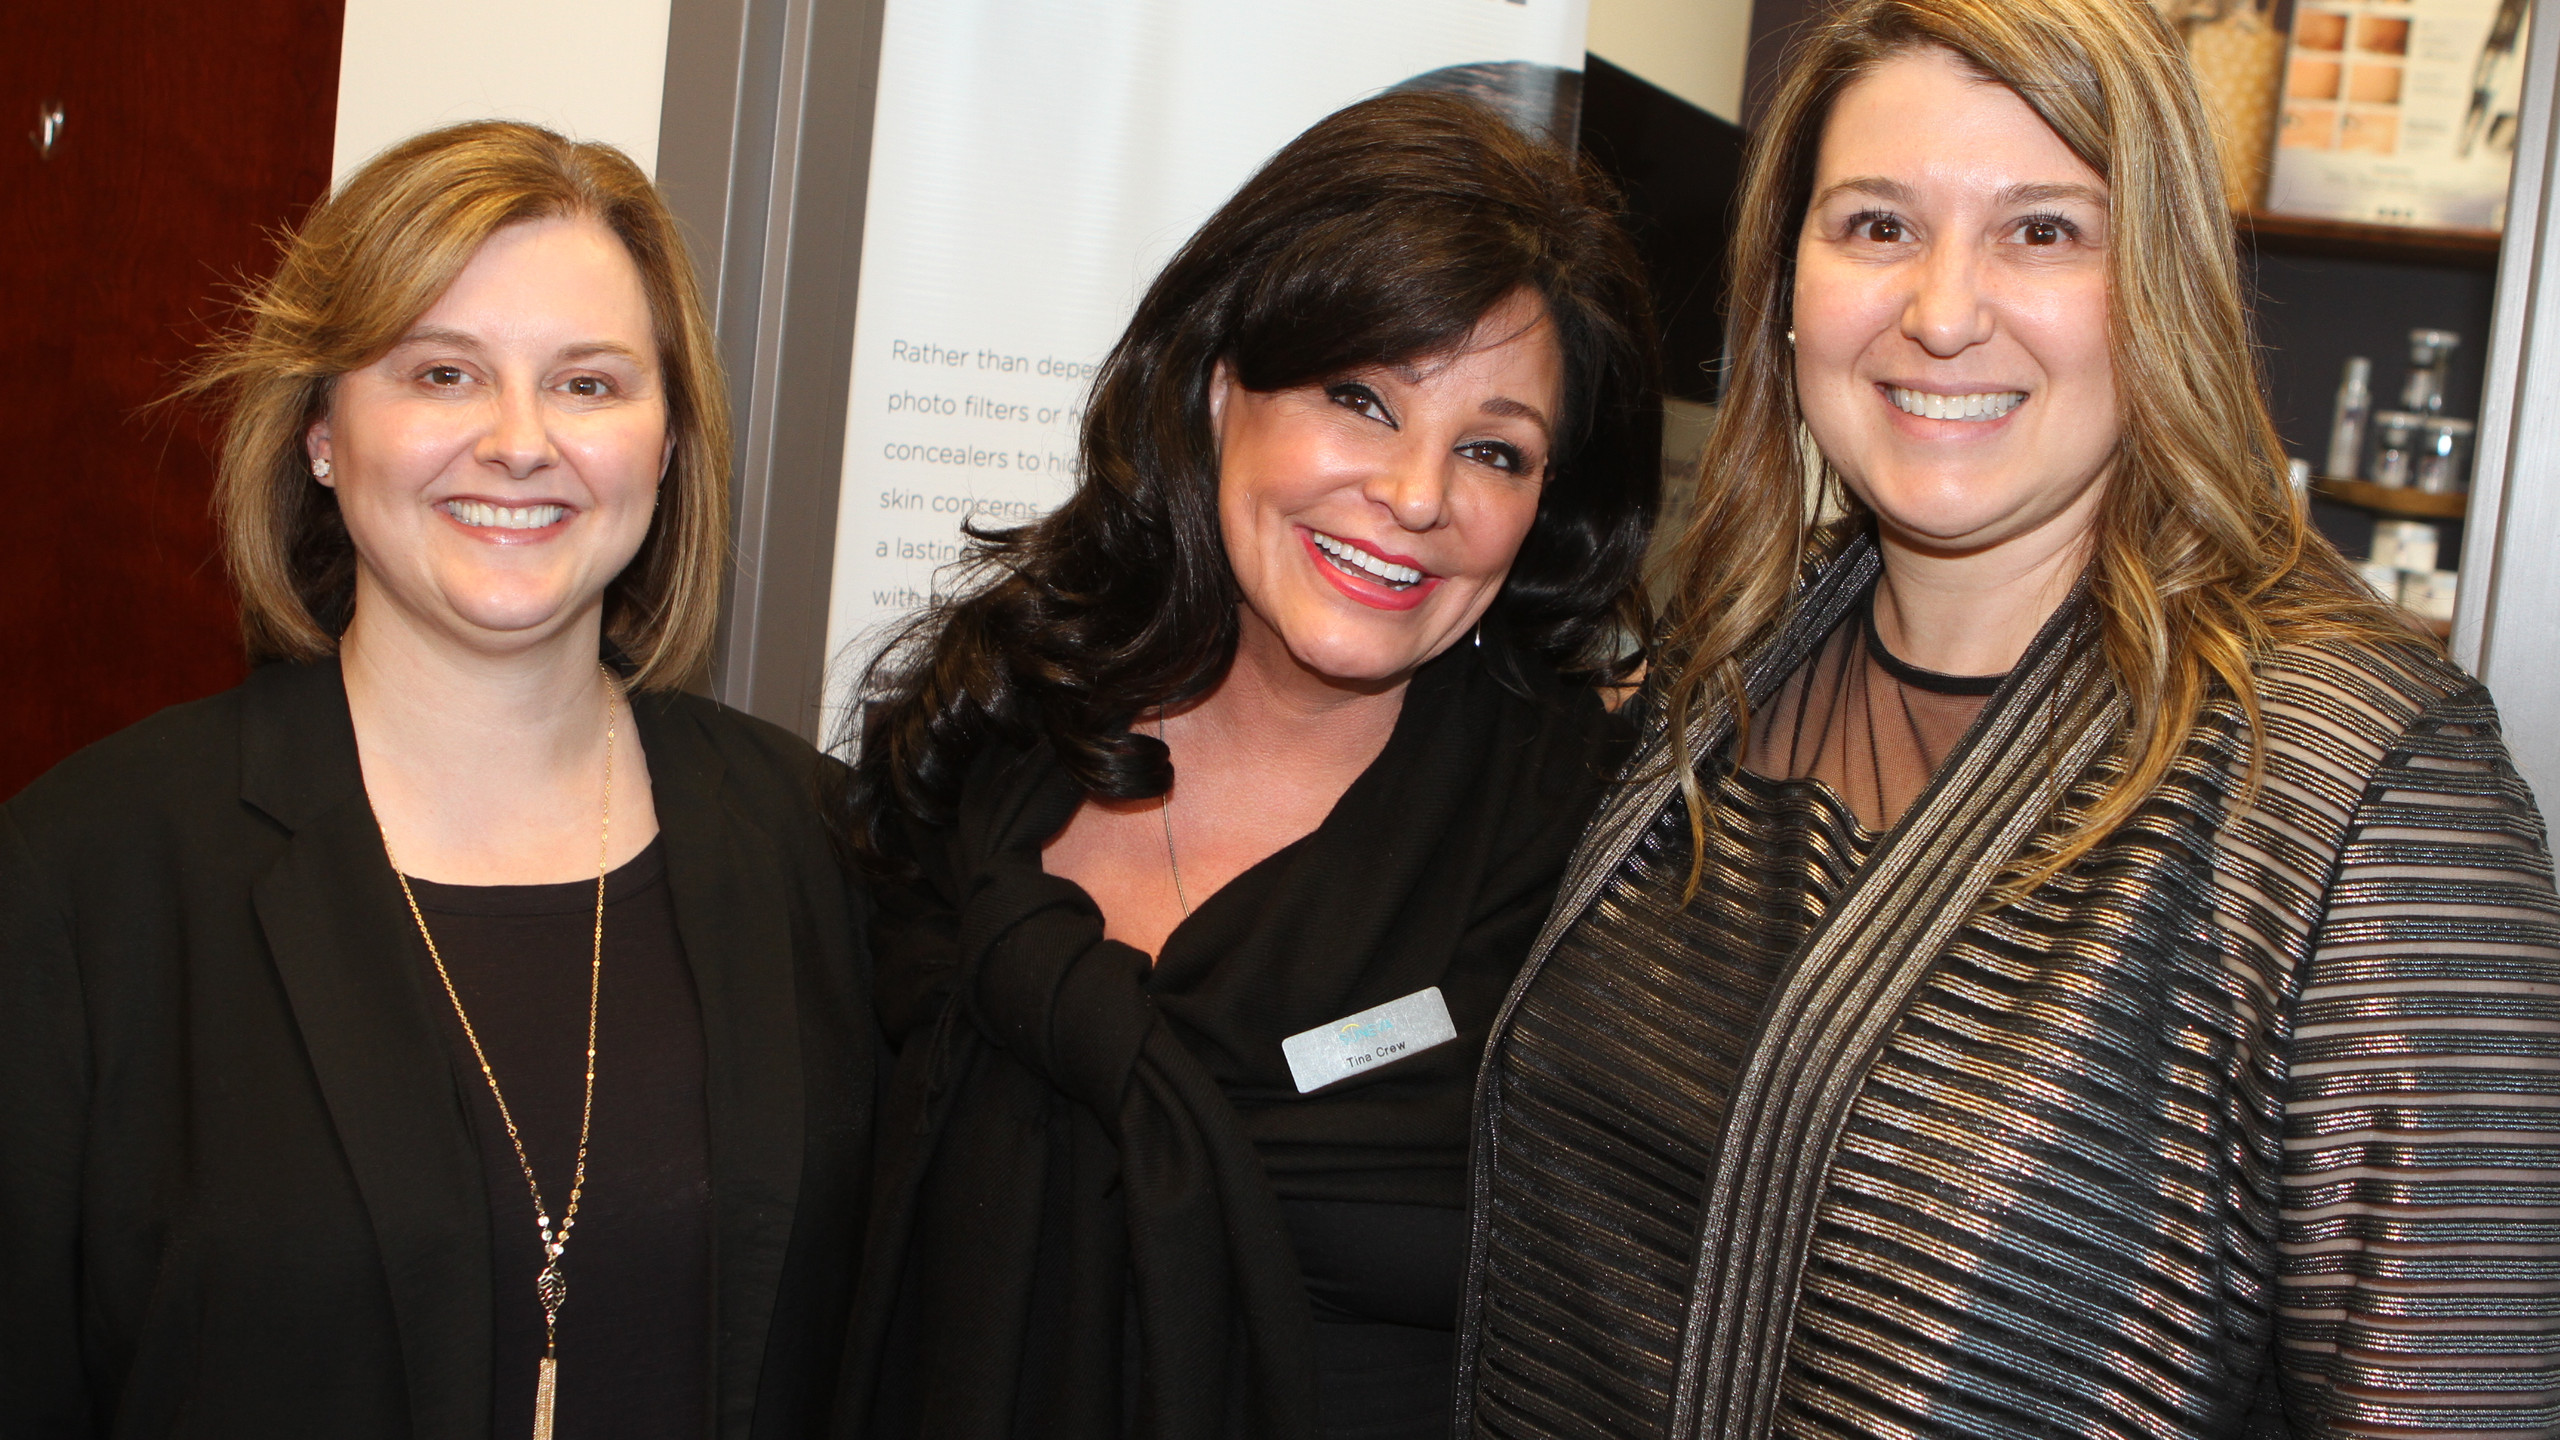 Lisia Woods, Tina Crew, Dr. Kim Lehman